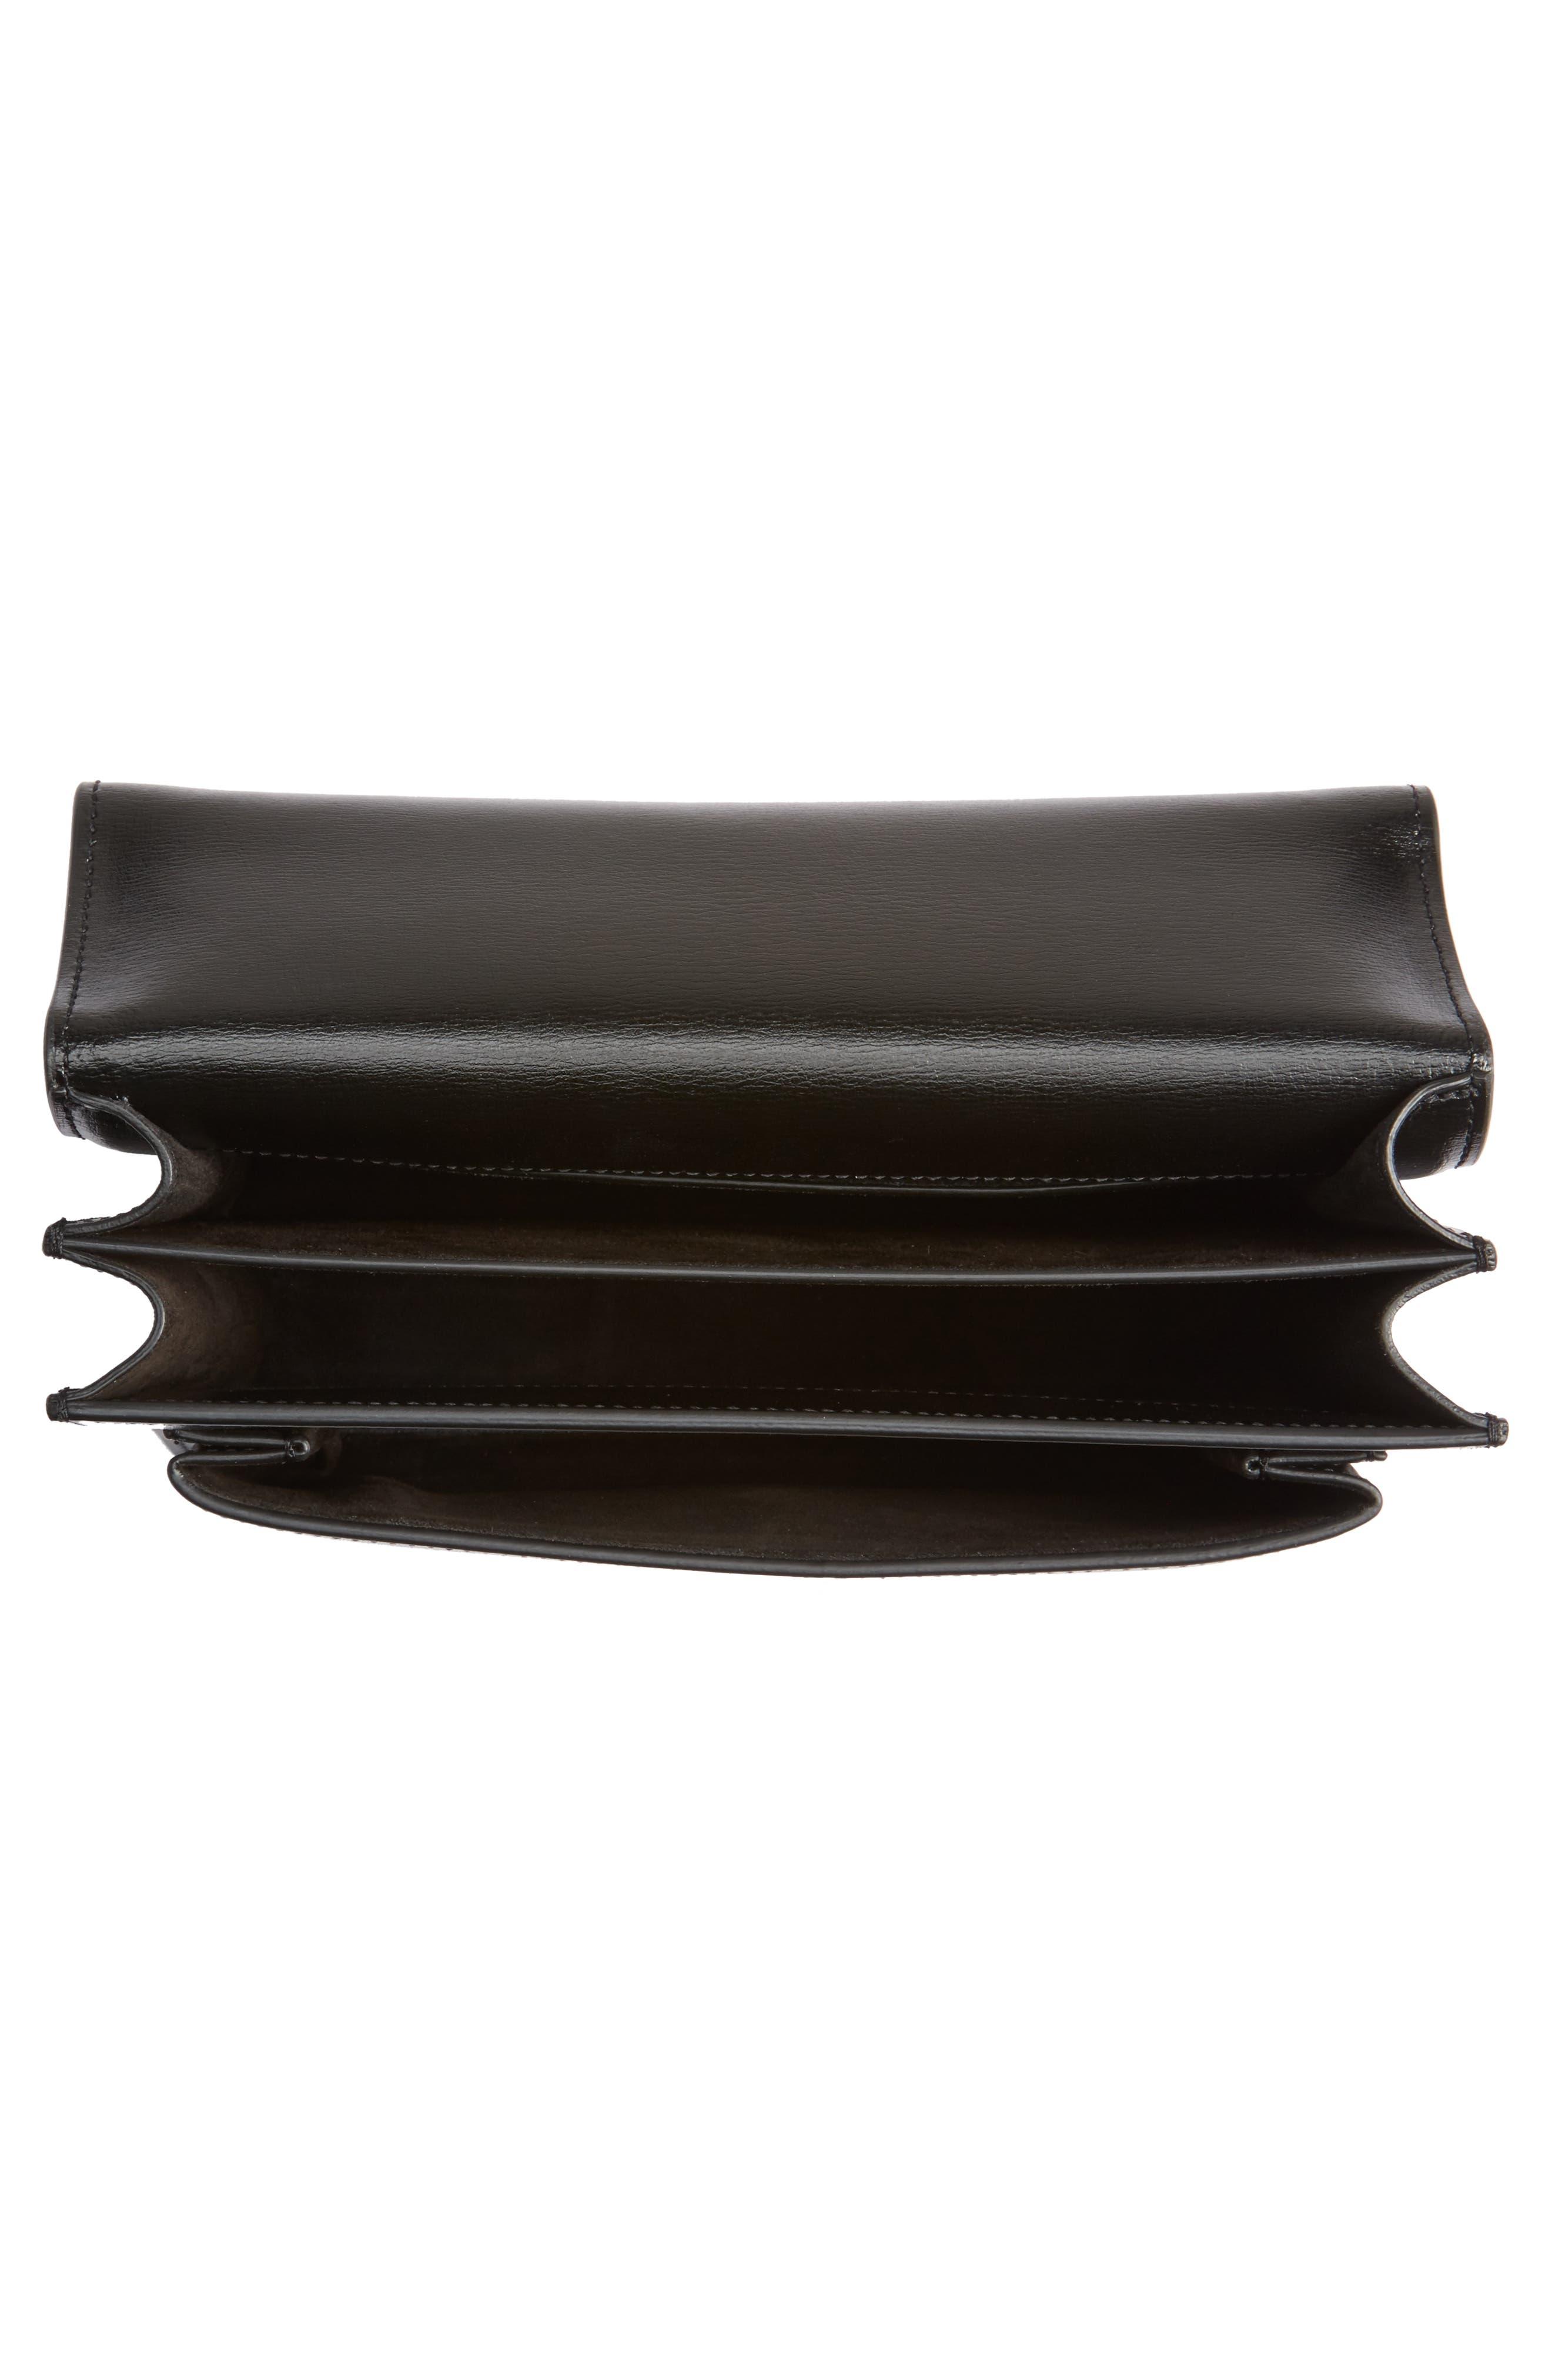 Medium Sunset Calfskin Shoulder Bag,                             Alternate thumbnail 3, color,                             Noir